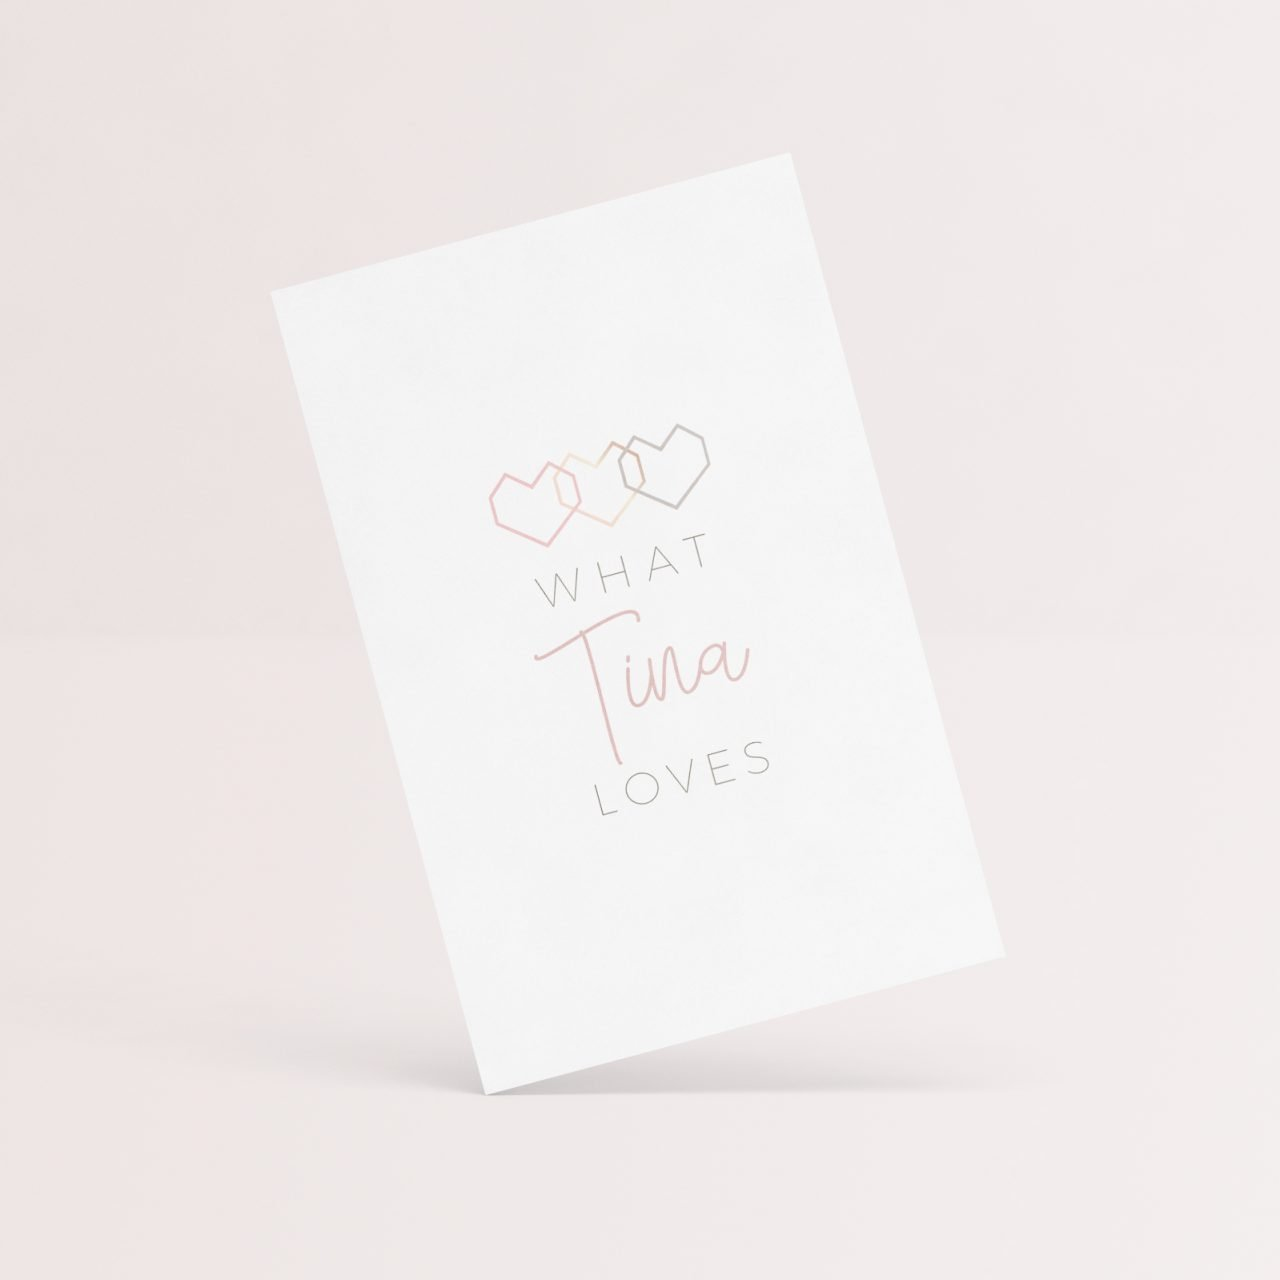 What Tina Loves logo mockup by Fancy Girl Design Studio